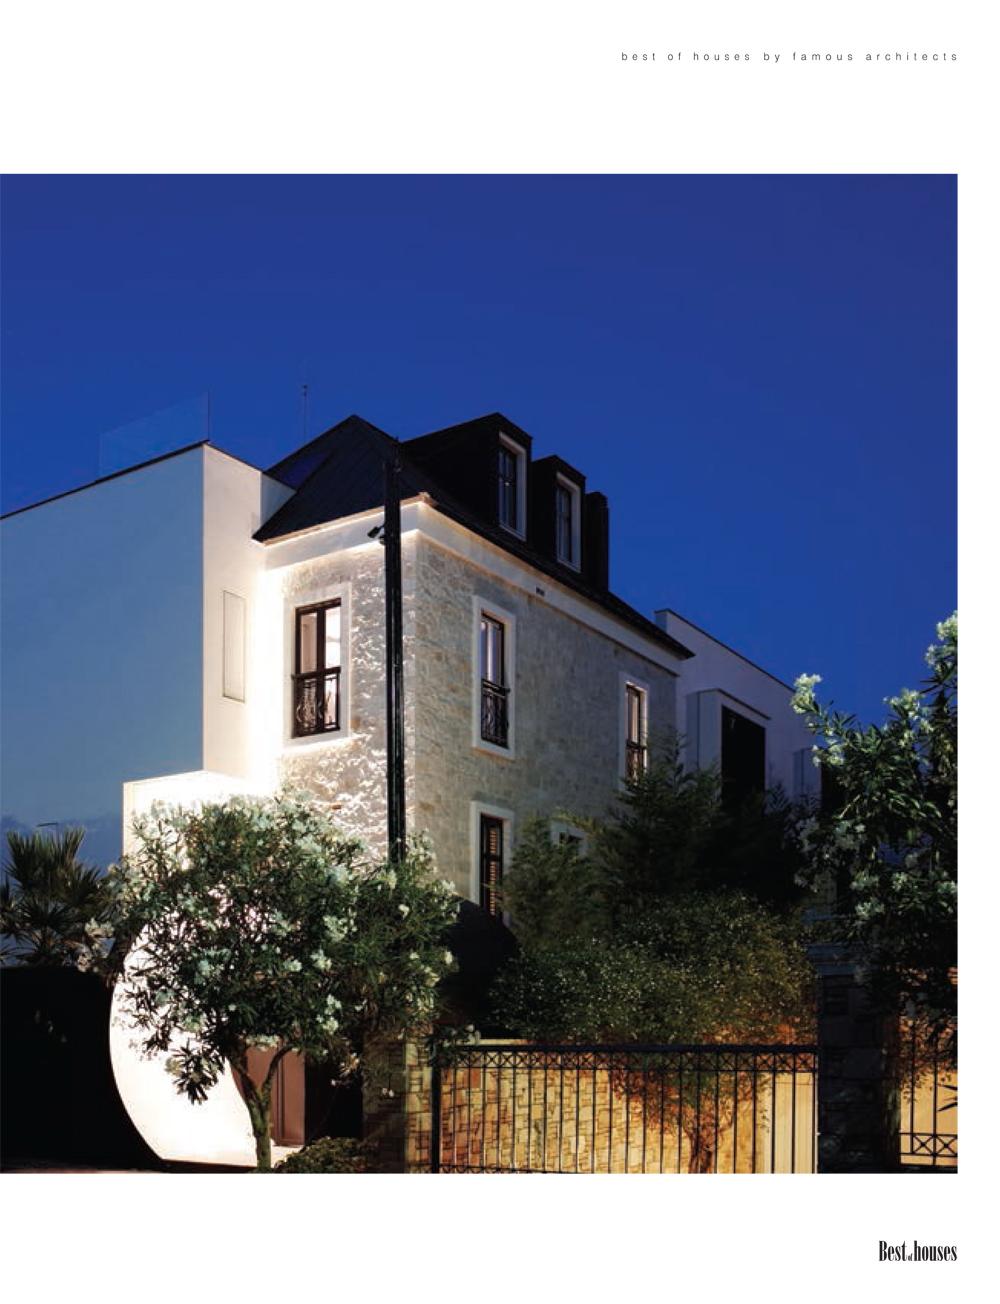 149_161_BoH_Dream_house-11.jpg